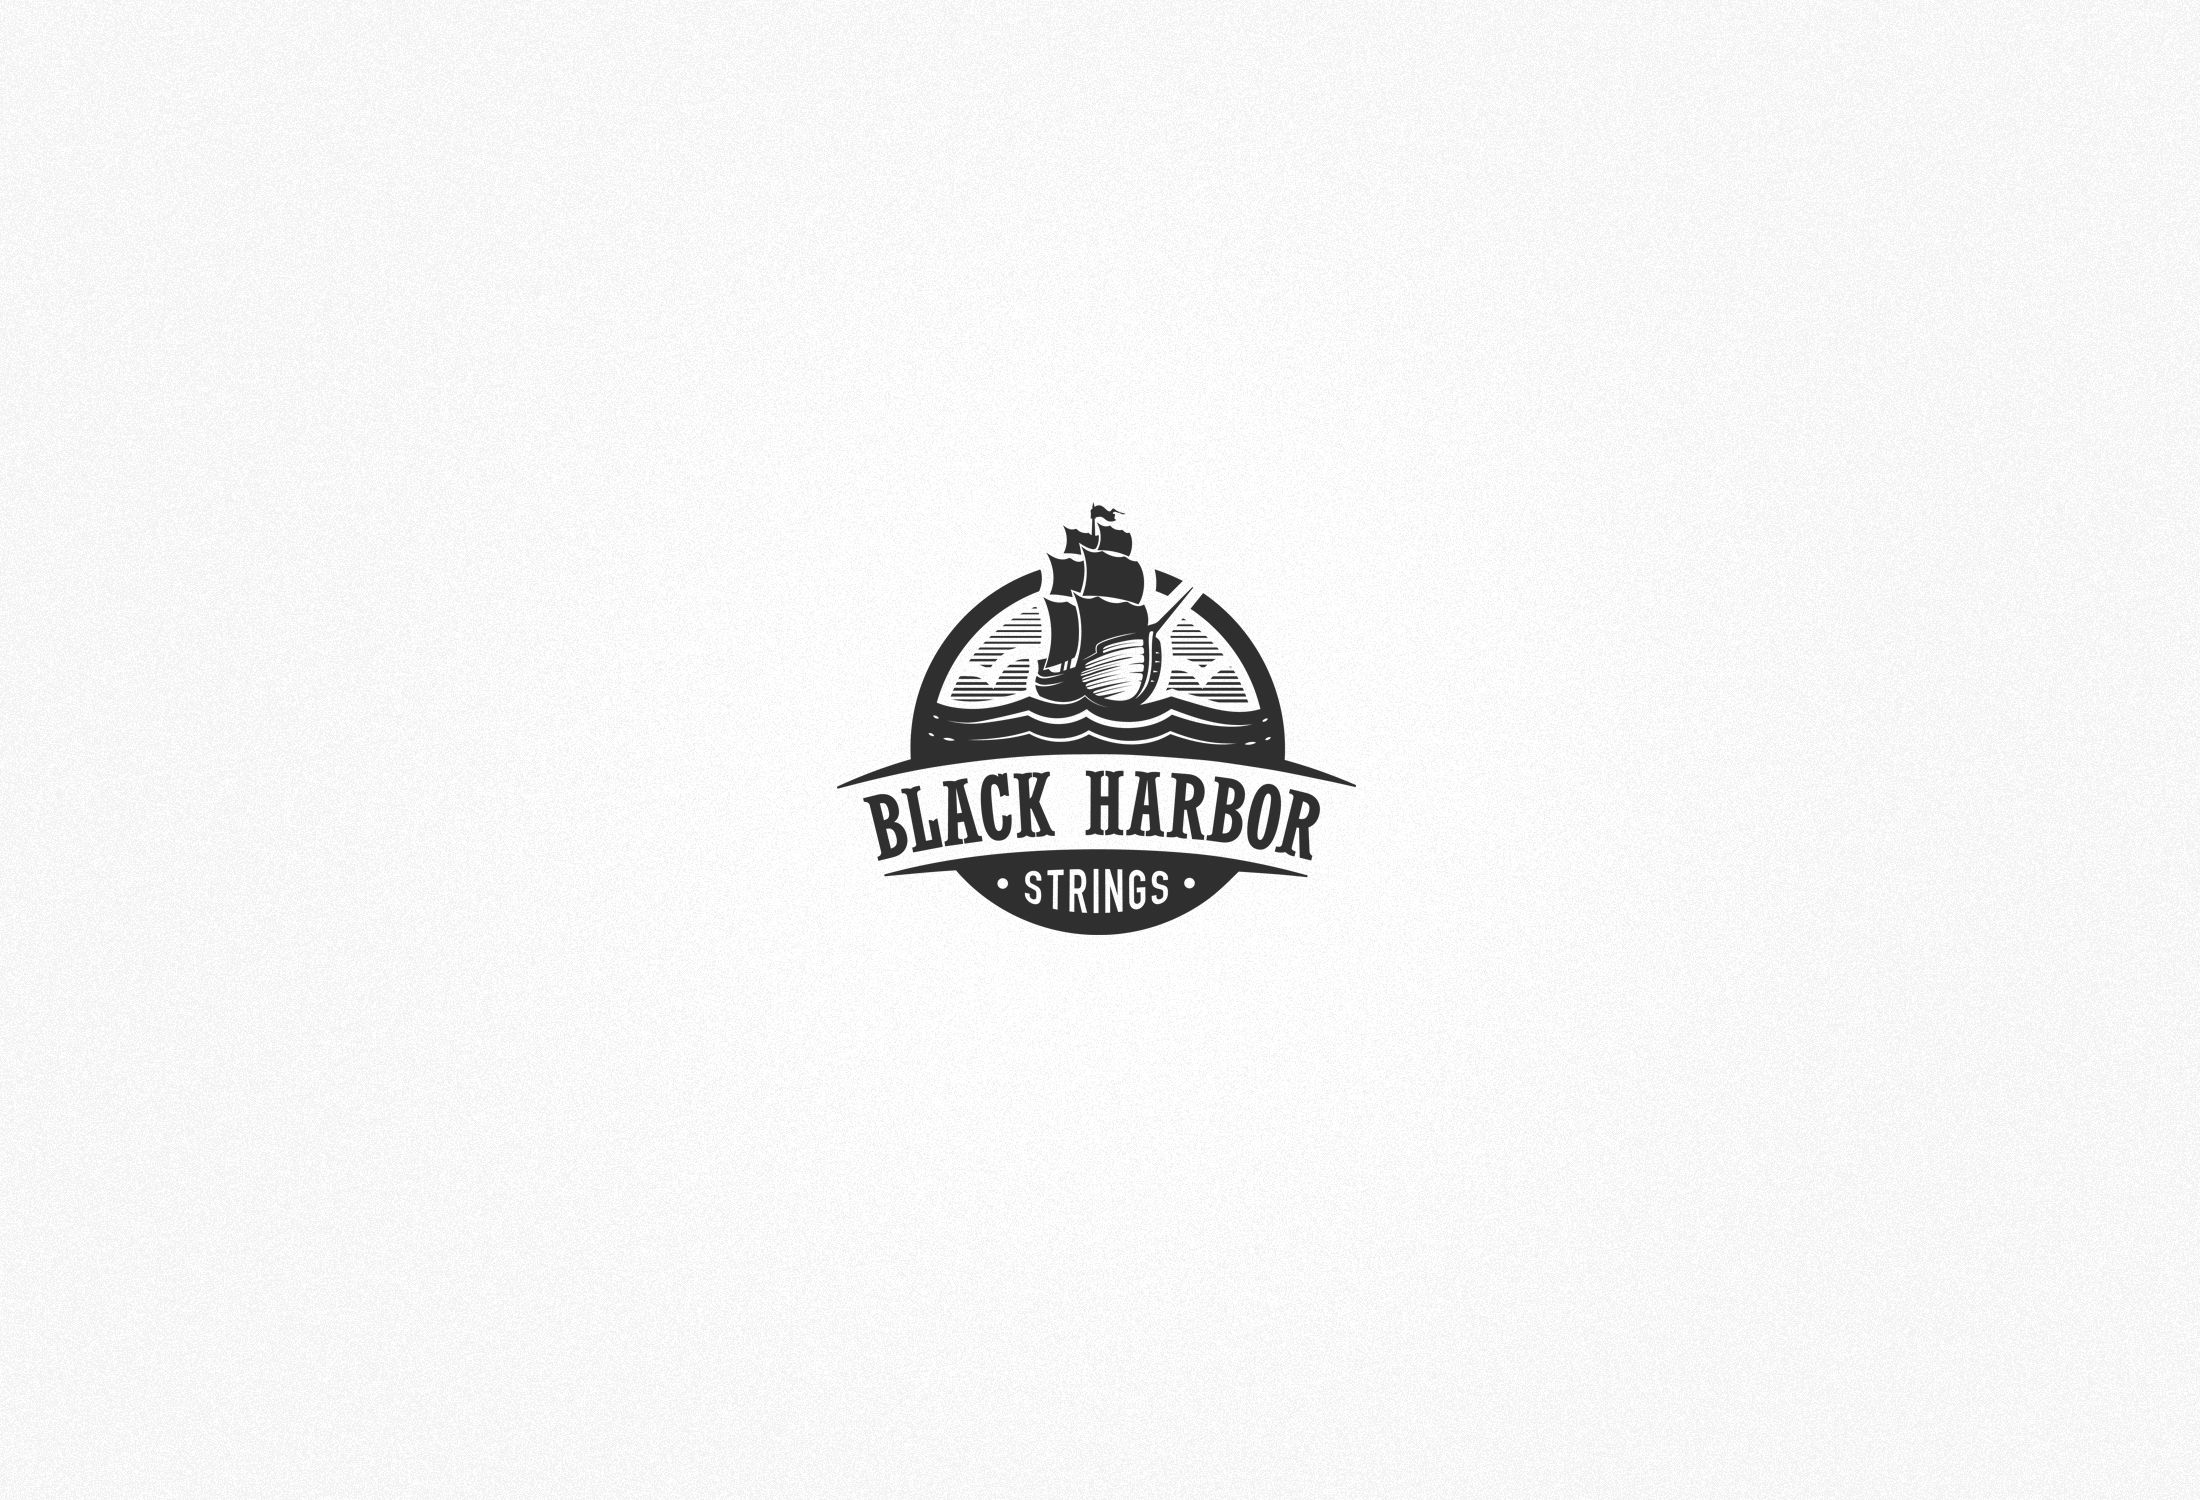 Vintage - Retro - Classic logotypes designed by Lonely Bird Studio (2015-2016)